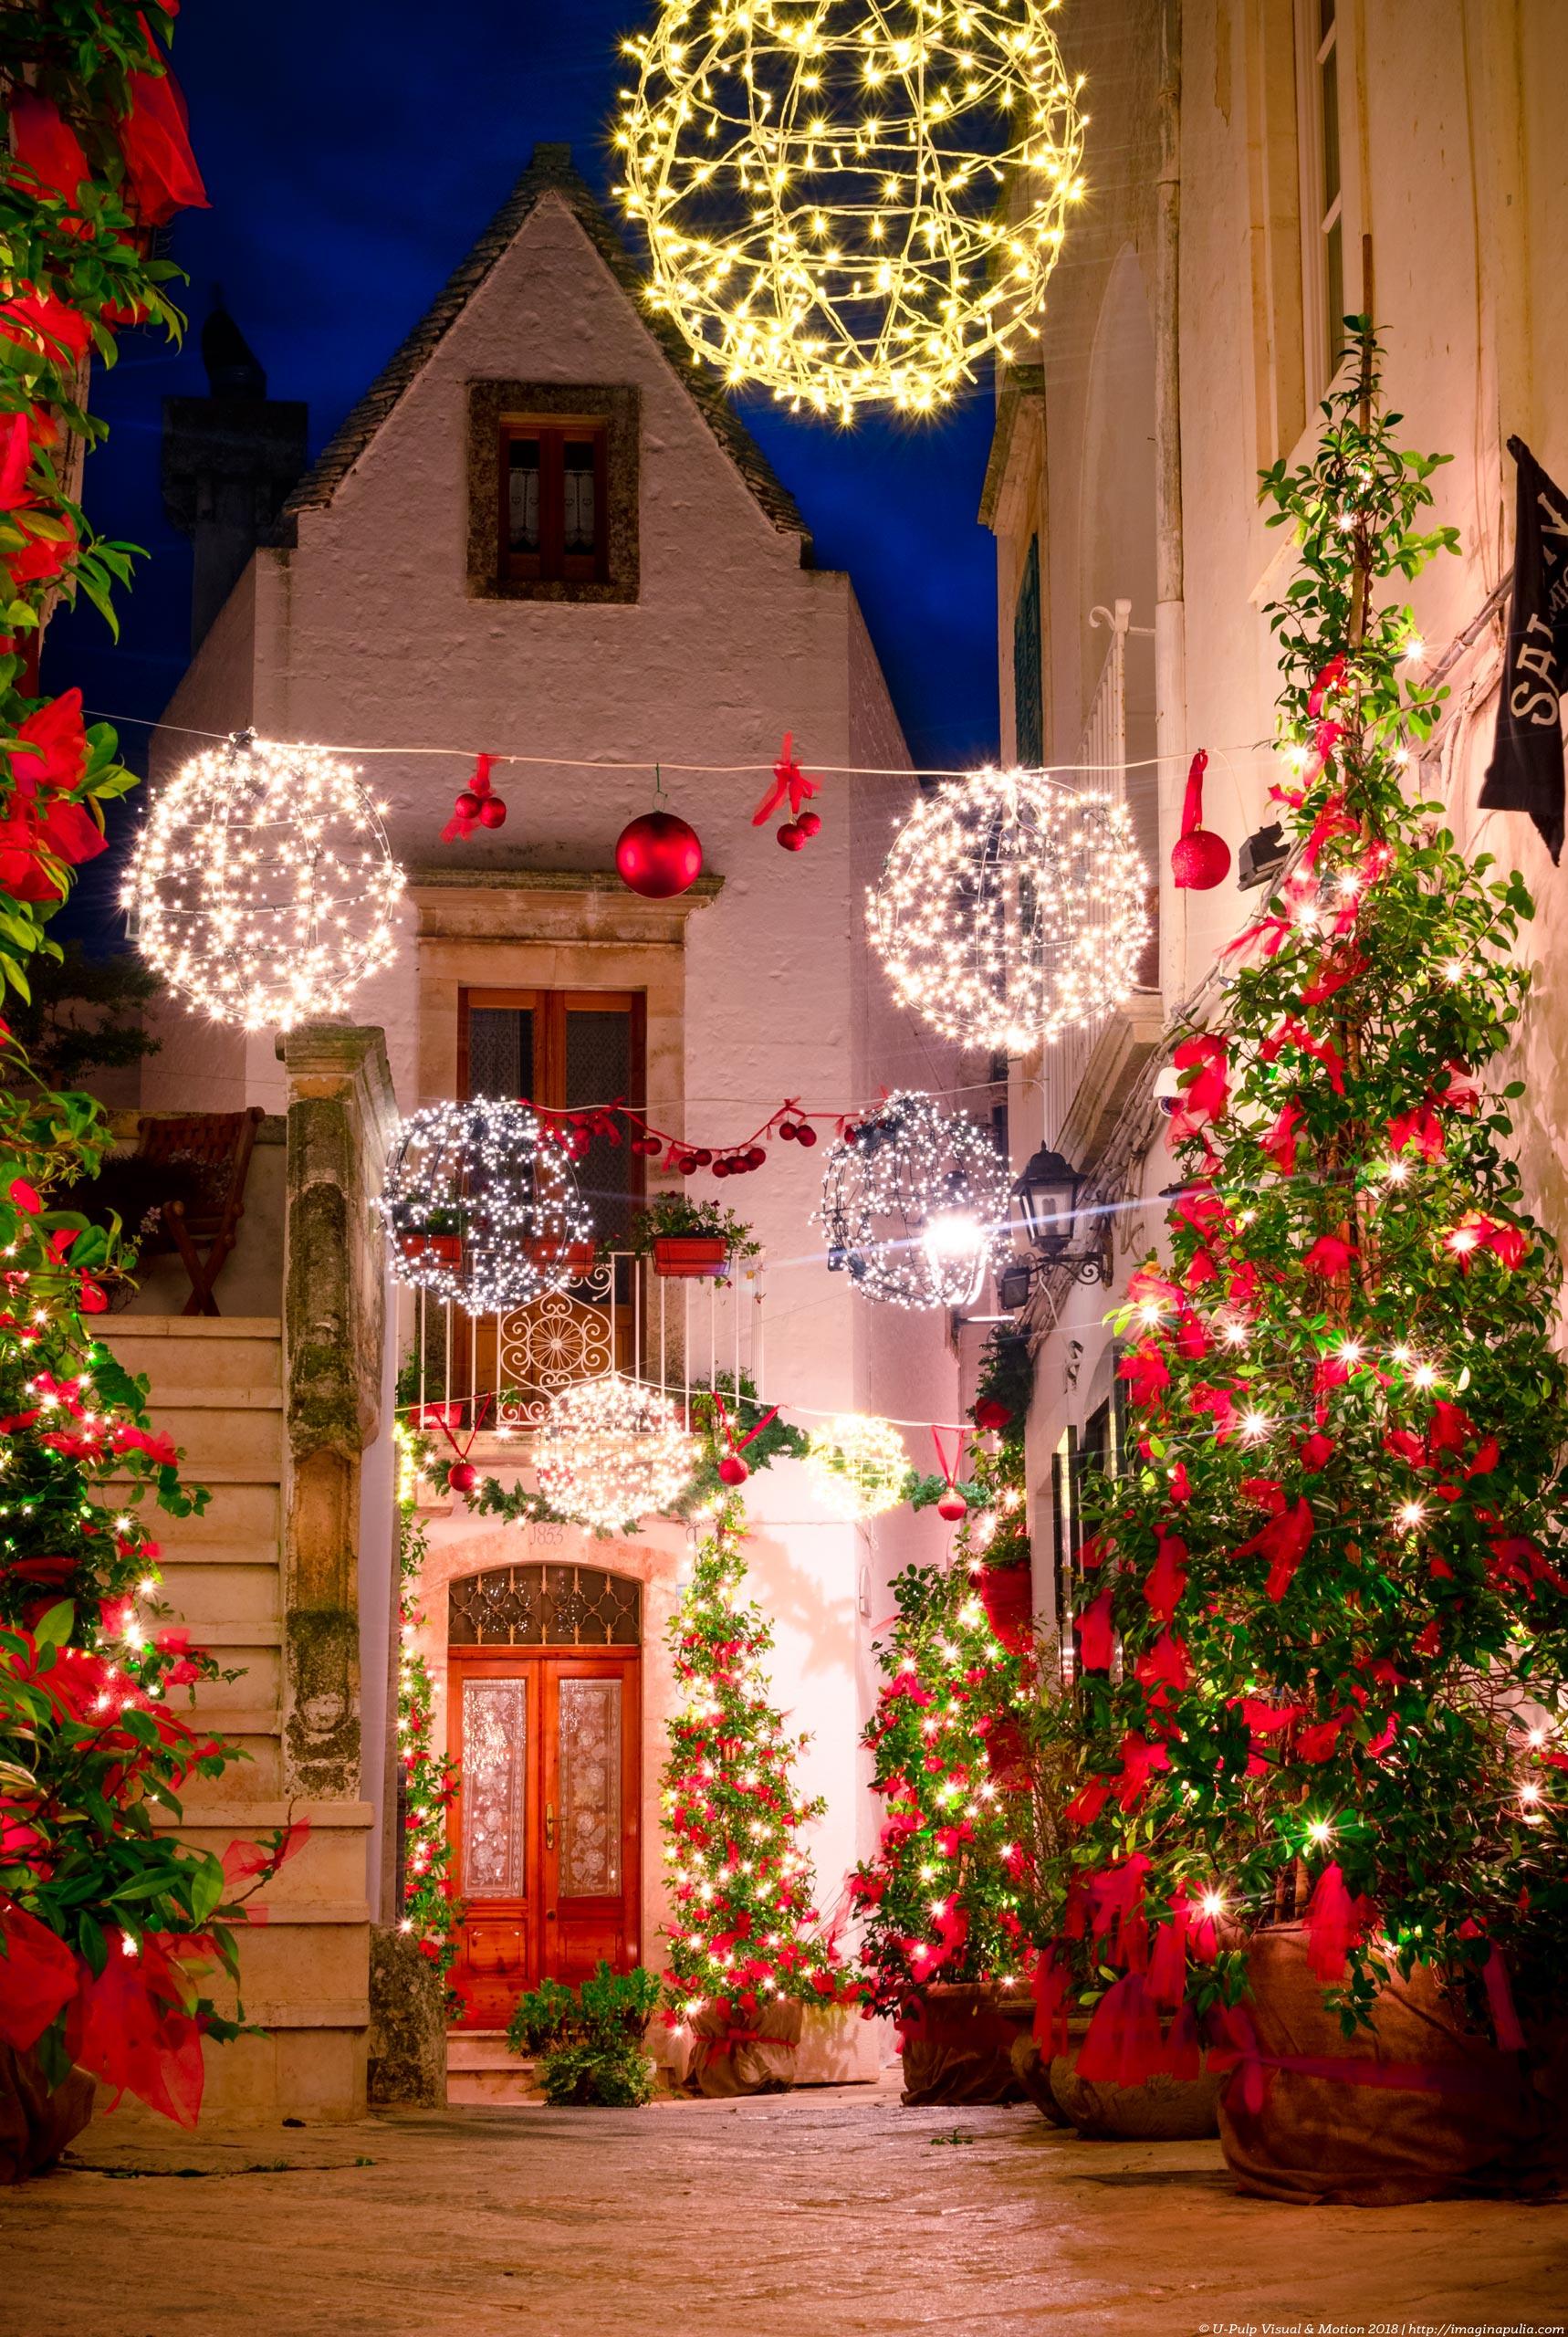 Christmas in Puglia, a narrow street of Locorotondo